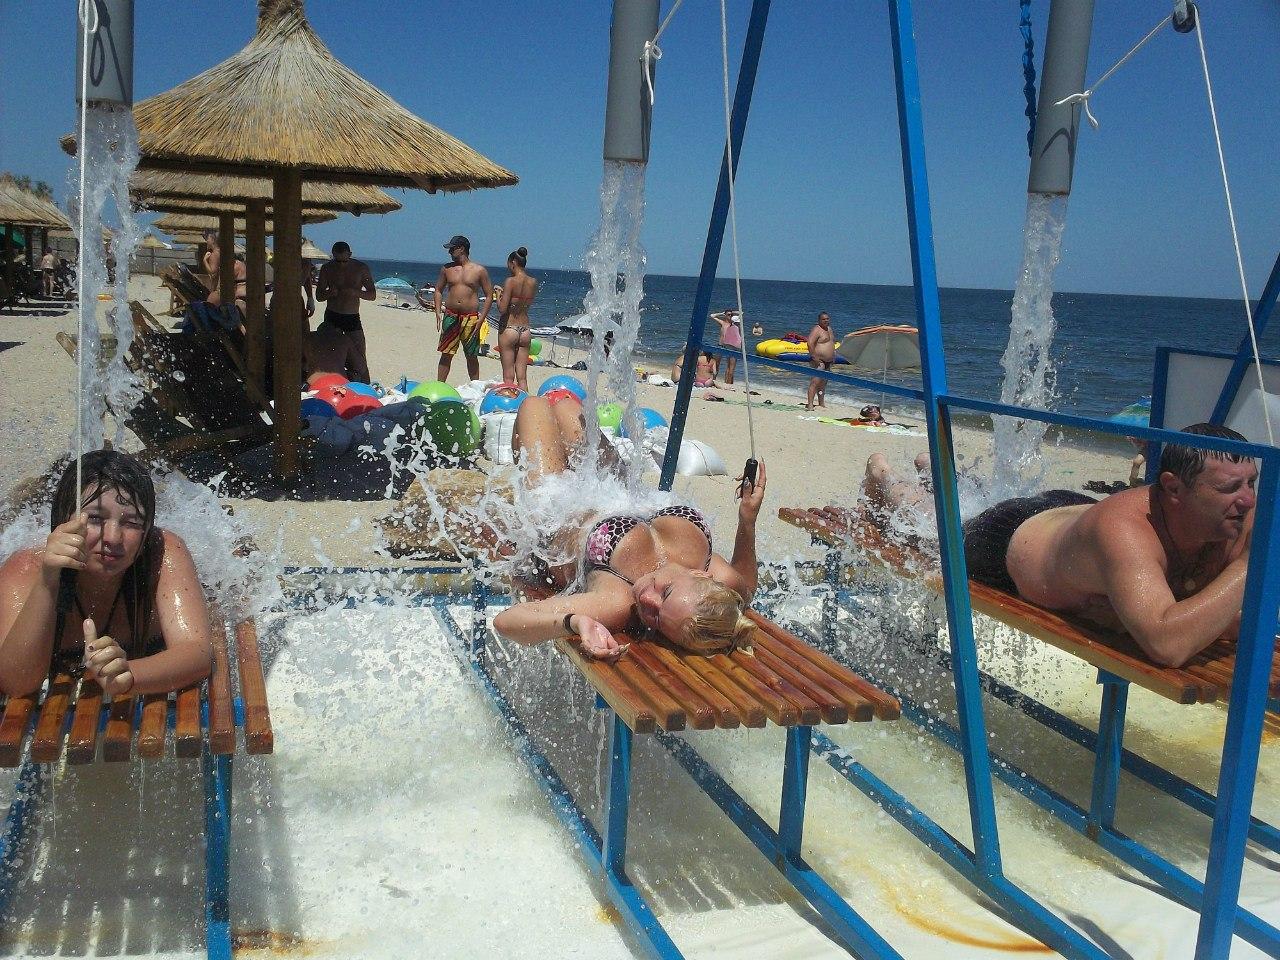 Азовское море. Бердянск. 2012 г. 4osRqMBfyHU